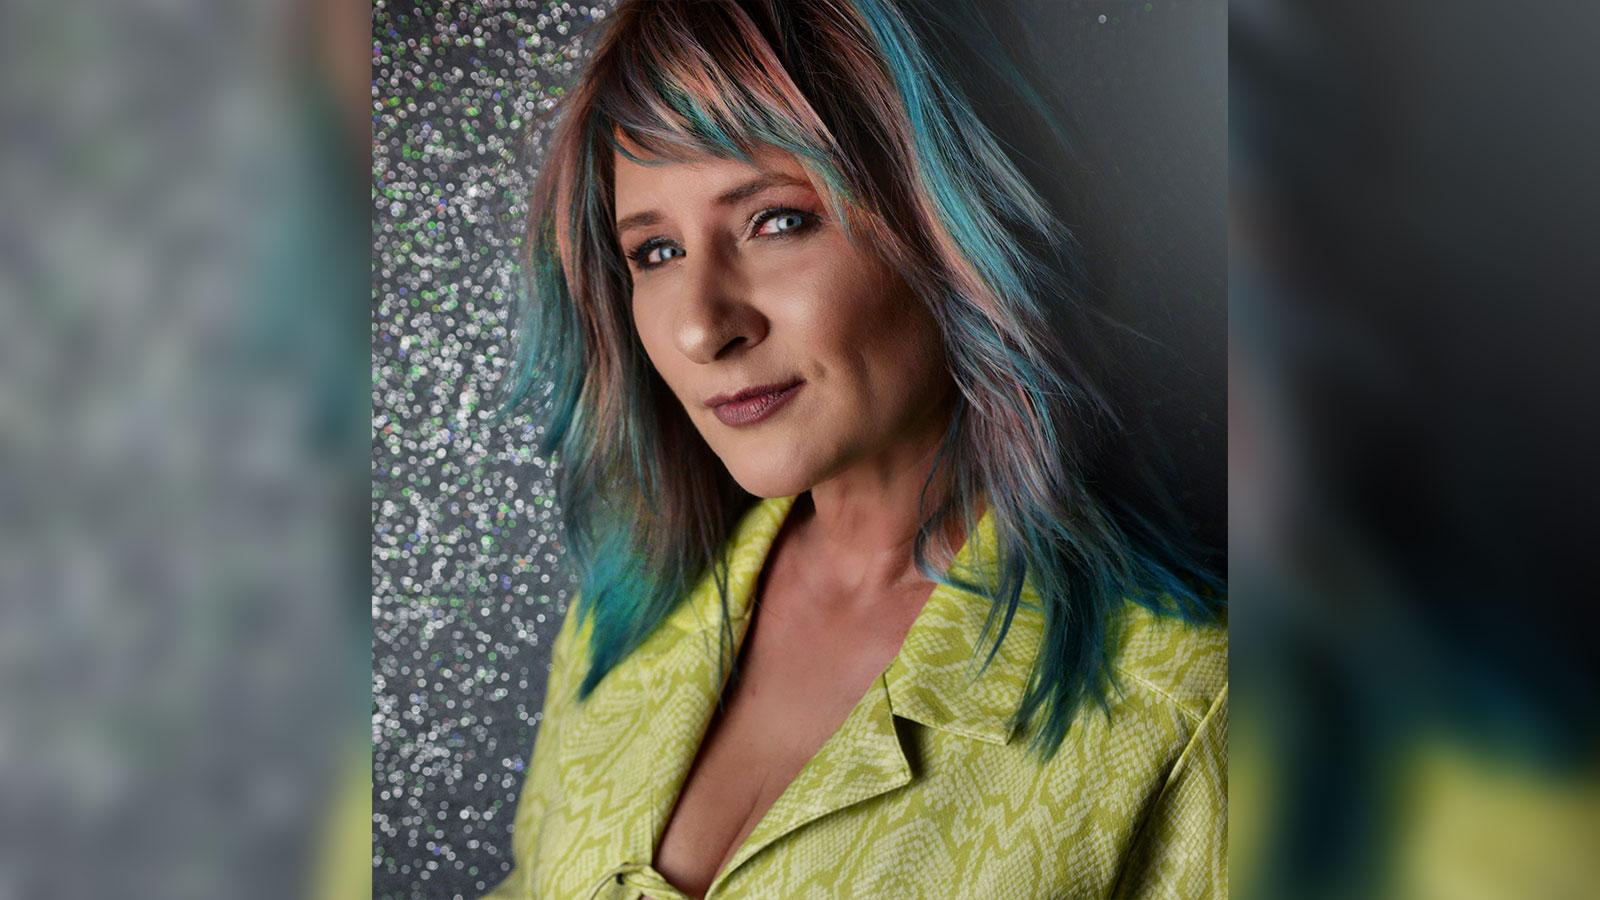 Stylist Spotlight: Jola De Legge, De Legge European Studio